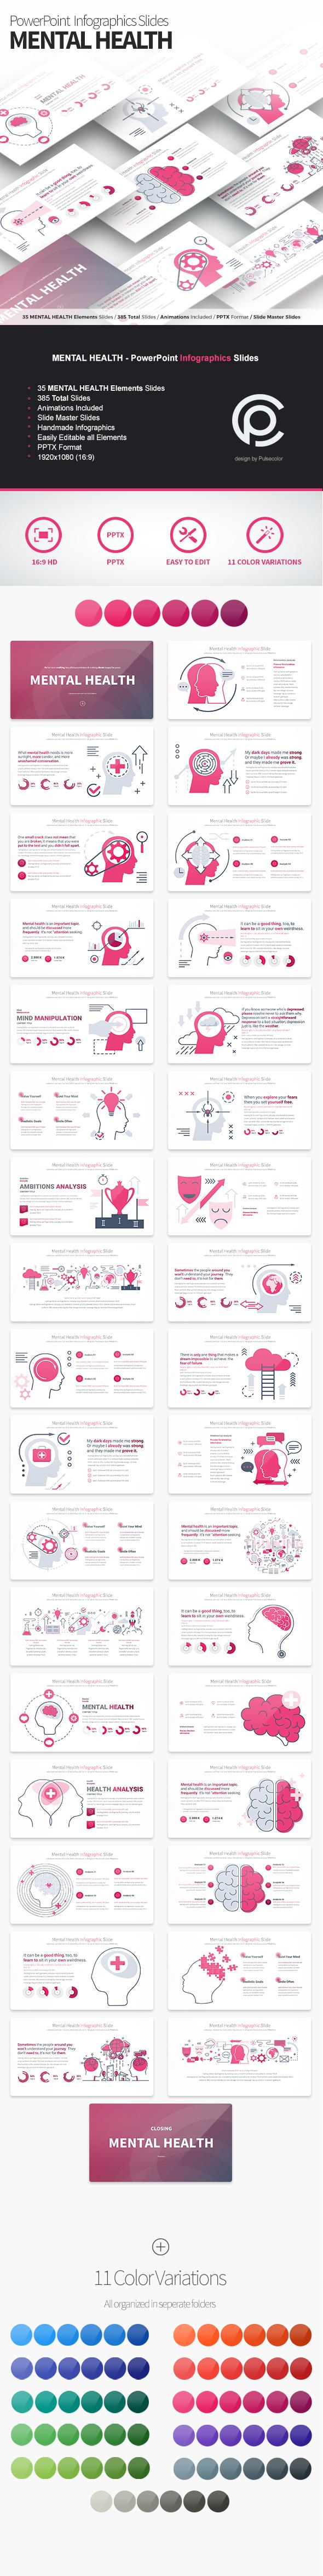 MENTAL HEALTH - PowerPoint Infographics Slides